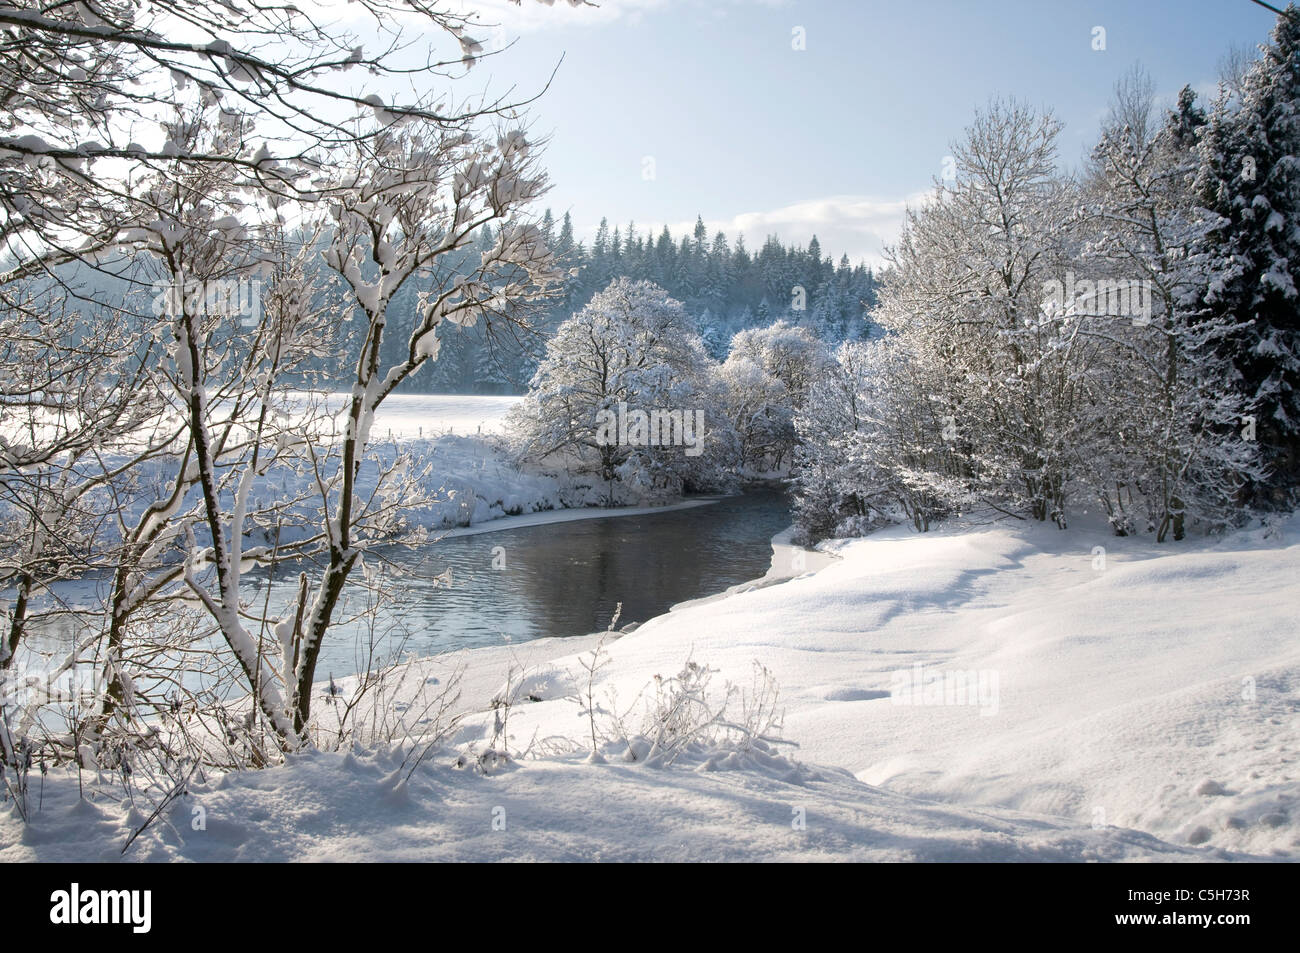 Yarrow agua en nieve profunda Imagen De Stock